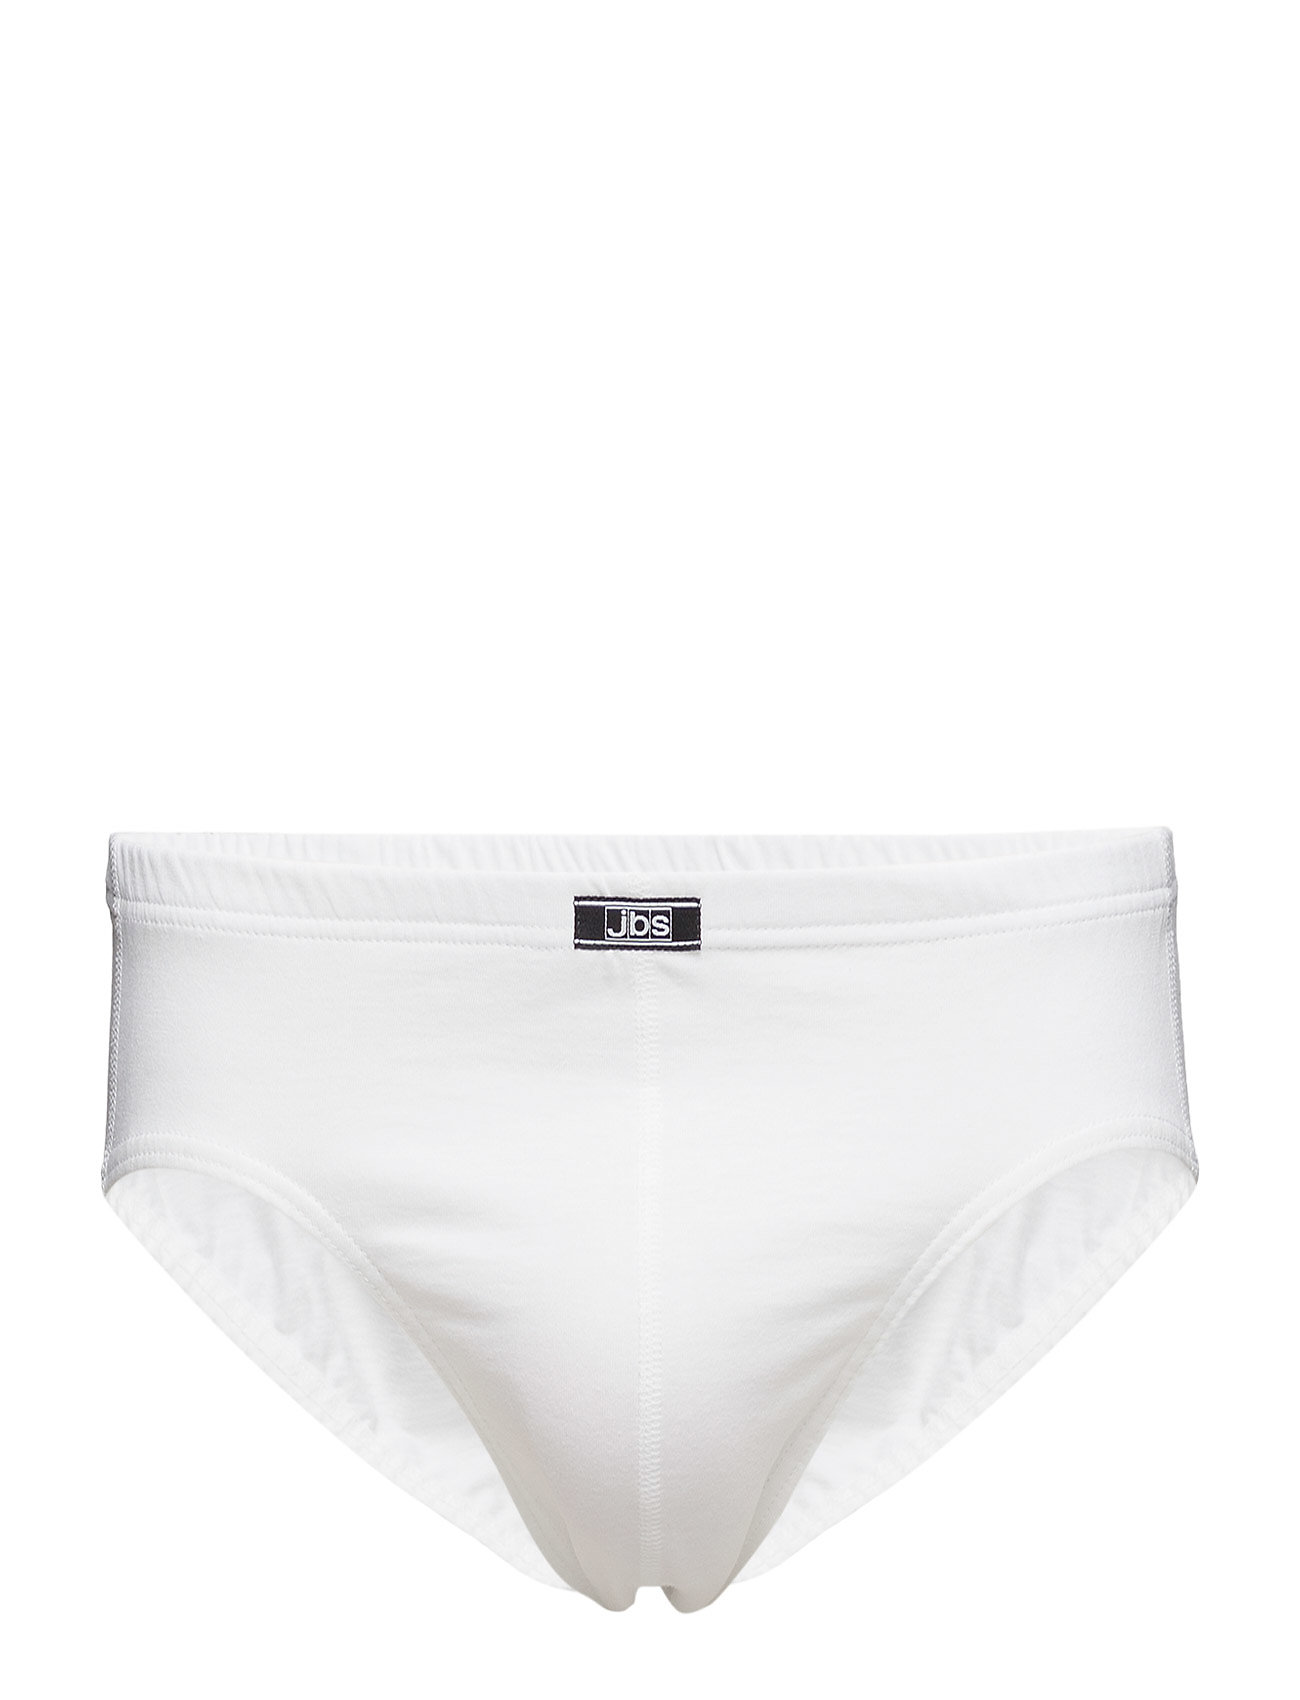 JBS JBS mini slip - WHITE